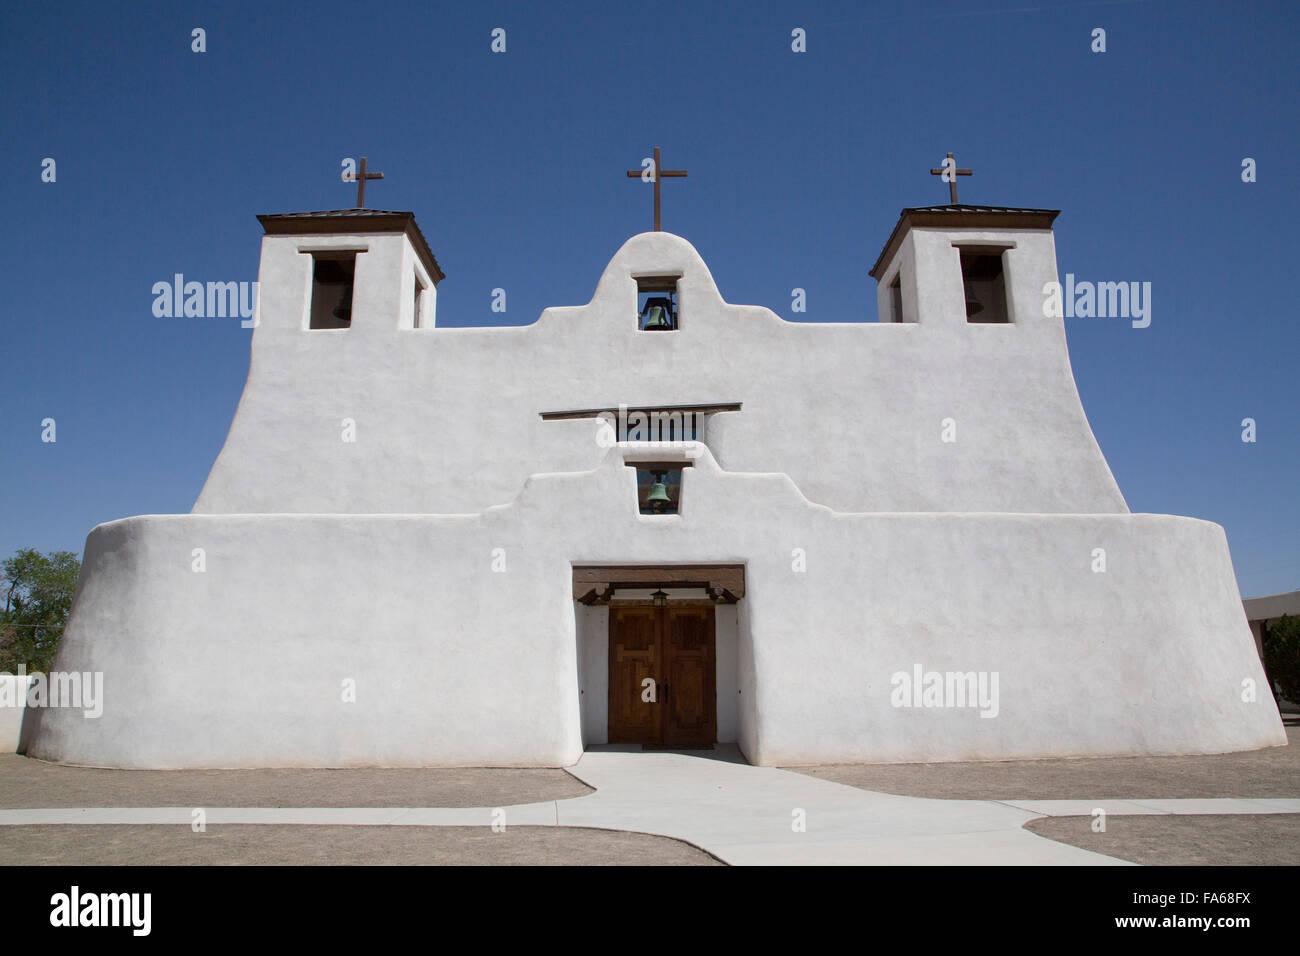 Isleta Pueblo, Saint Augustine Mission, originally built in 1612, New Mexico, USA Stock Photo